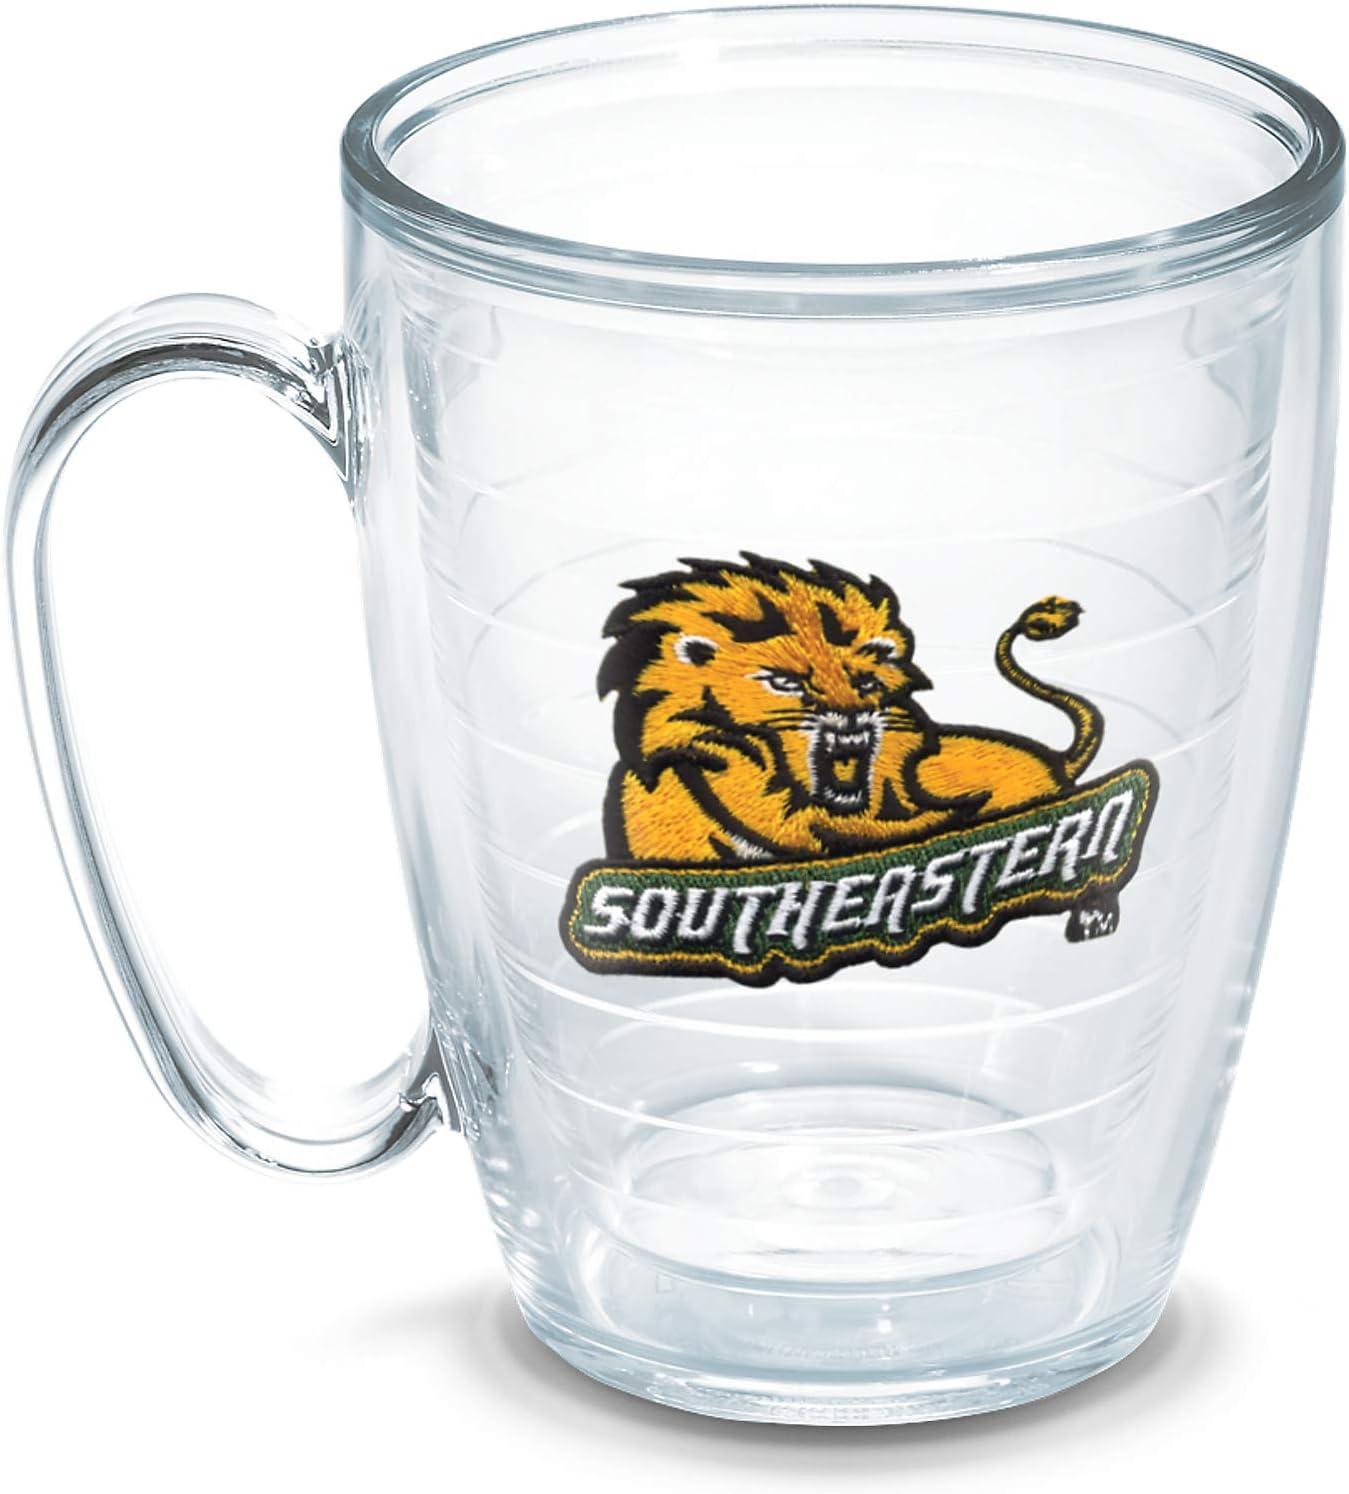 Tervis 1050809  S E Louisiana University Mug Boxed,Clear,16 oz